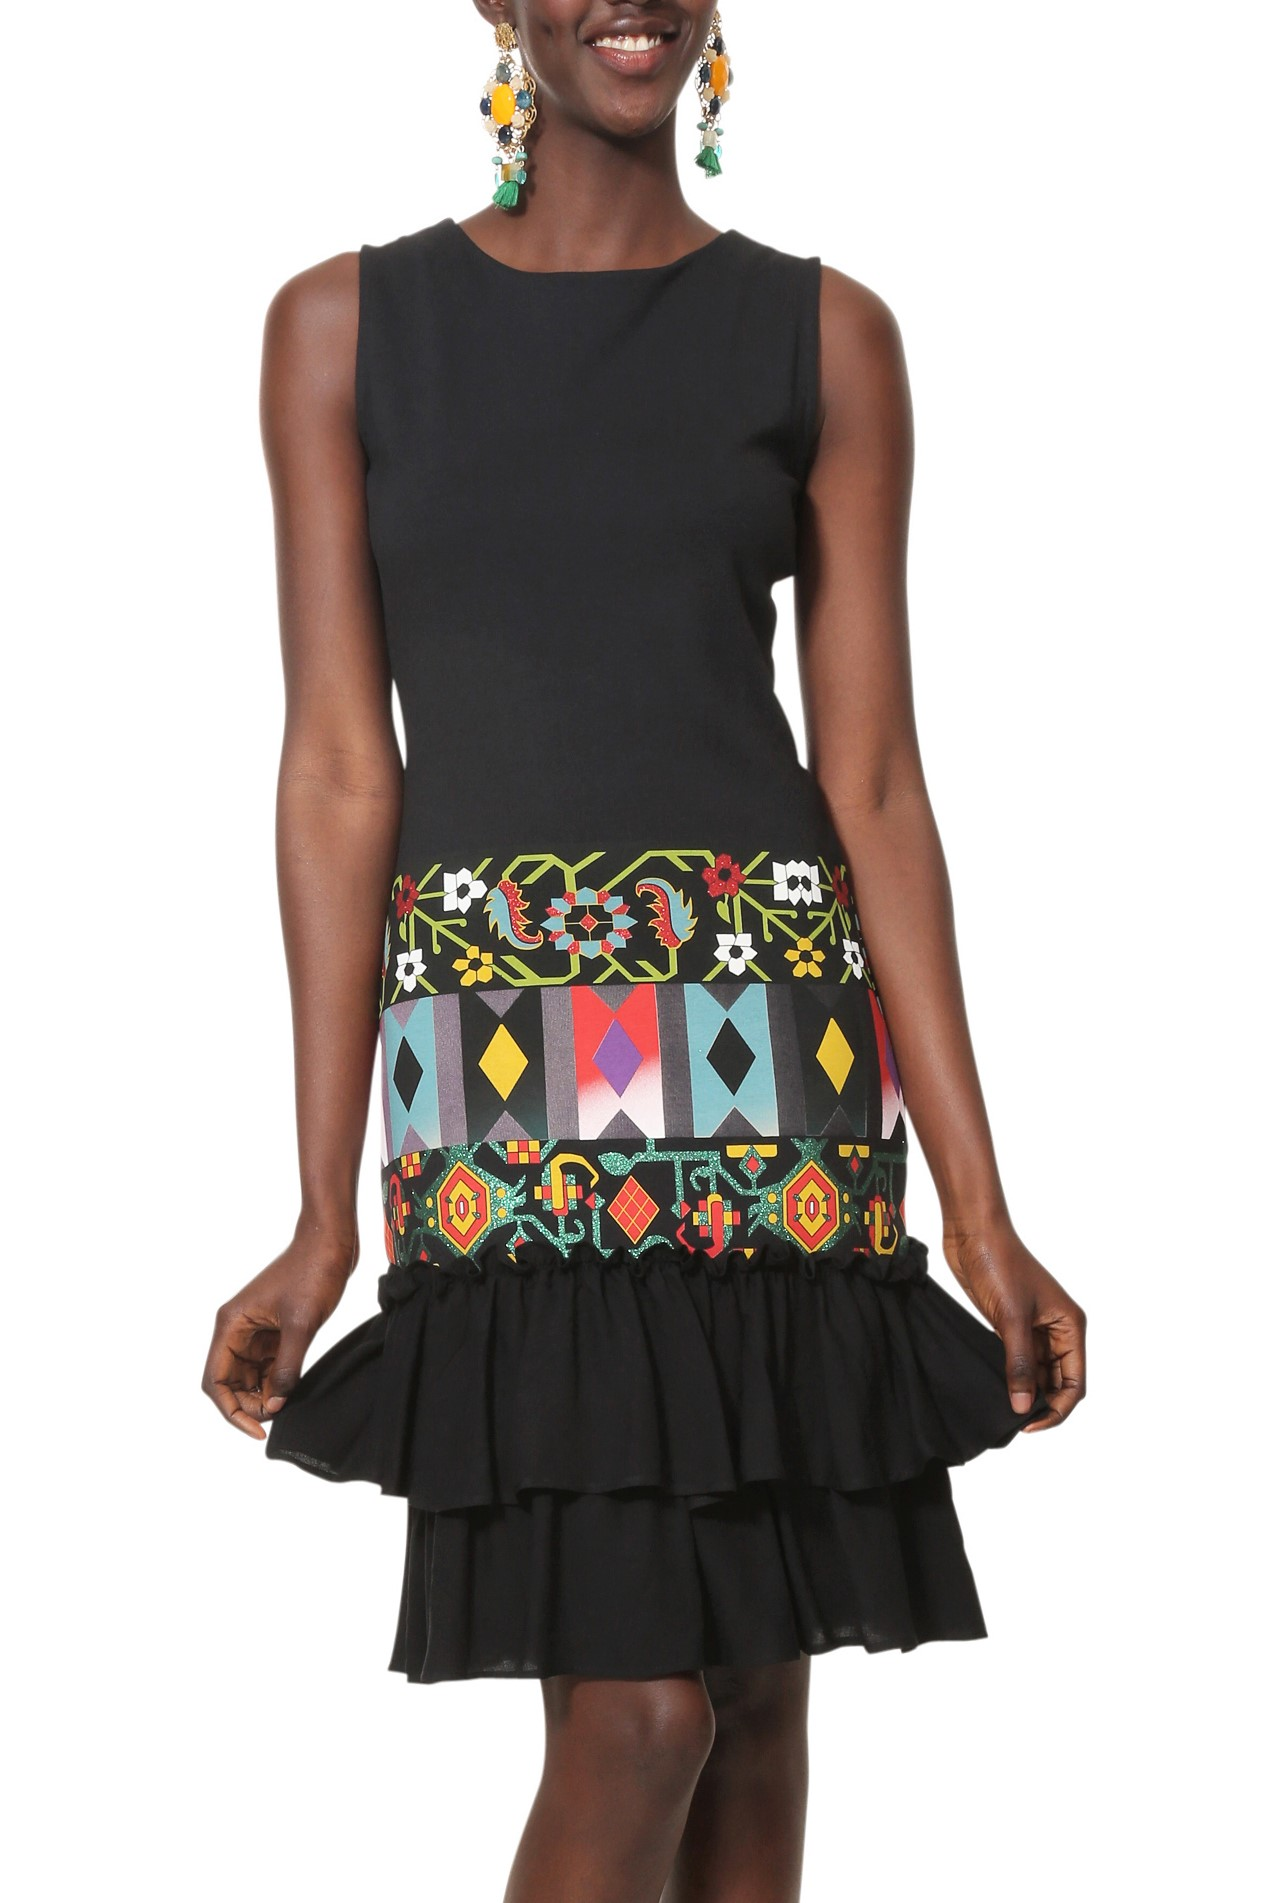 Desigual čierne šaty Vest Elisabeth s farebnými motívmi - Glami.sk 26c3d65b6c2